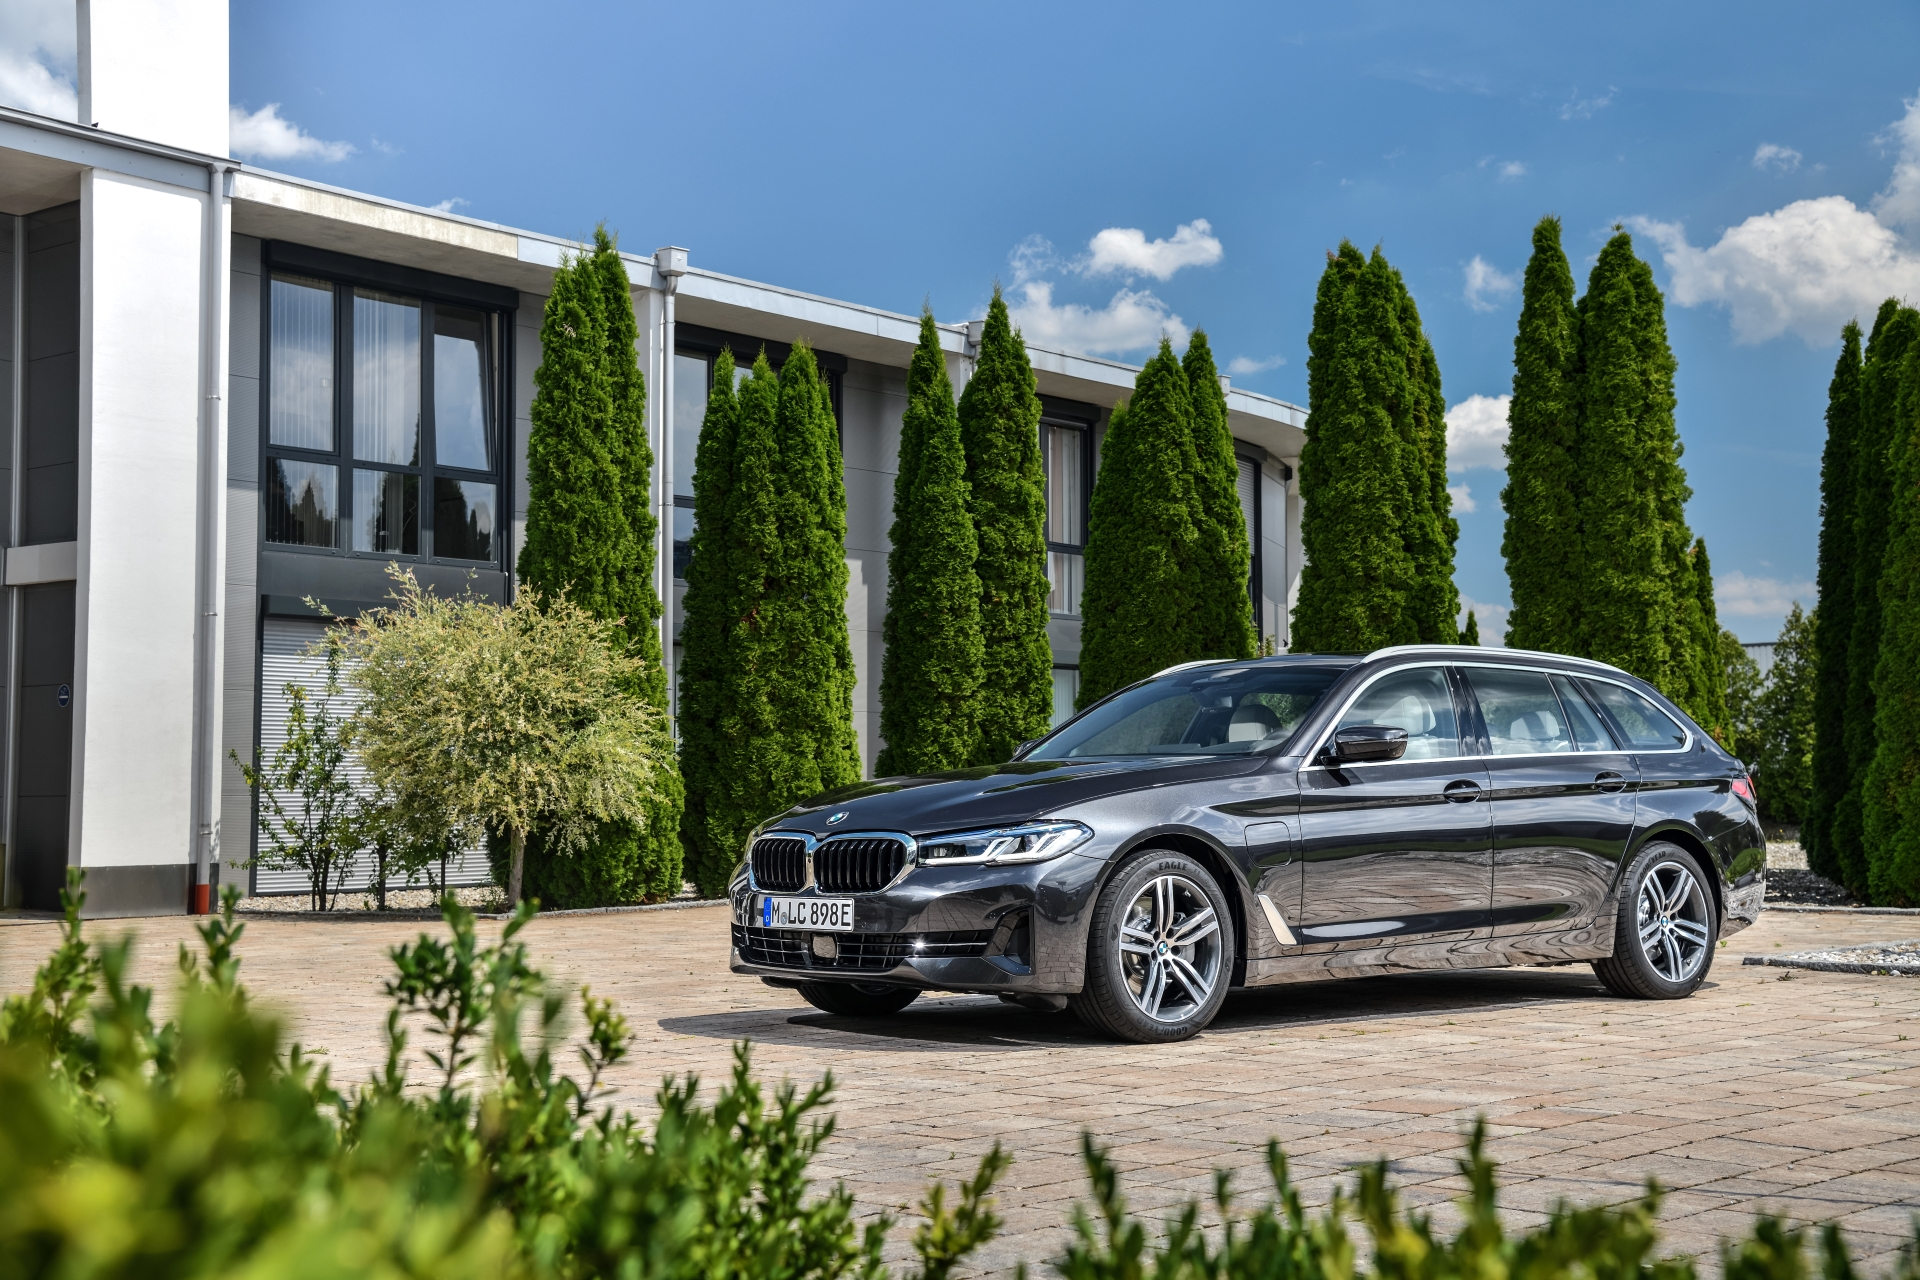 The new BMW 530e xDrive Touring G31 LCI